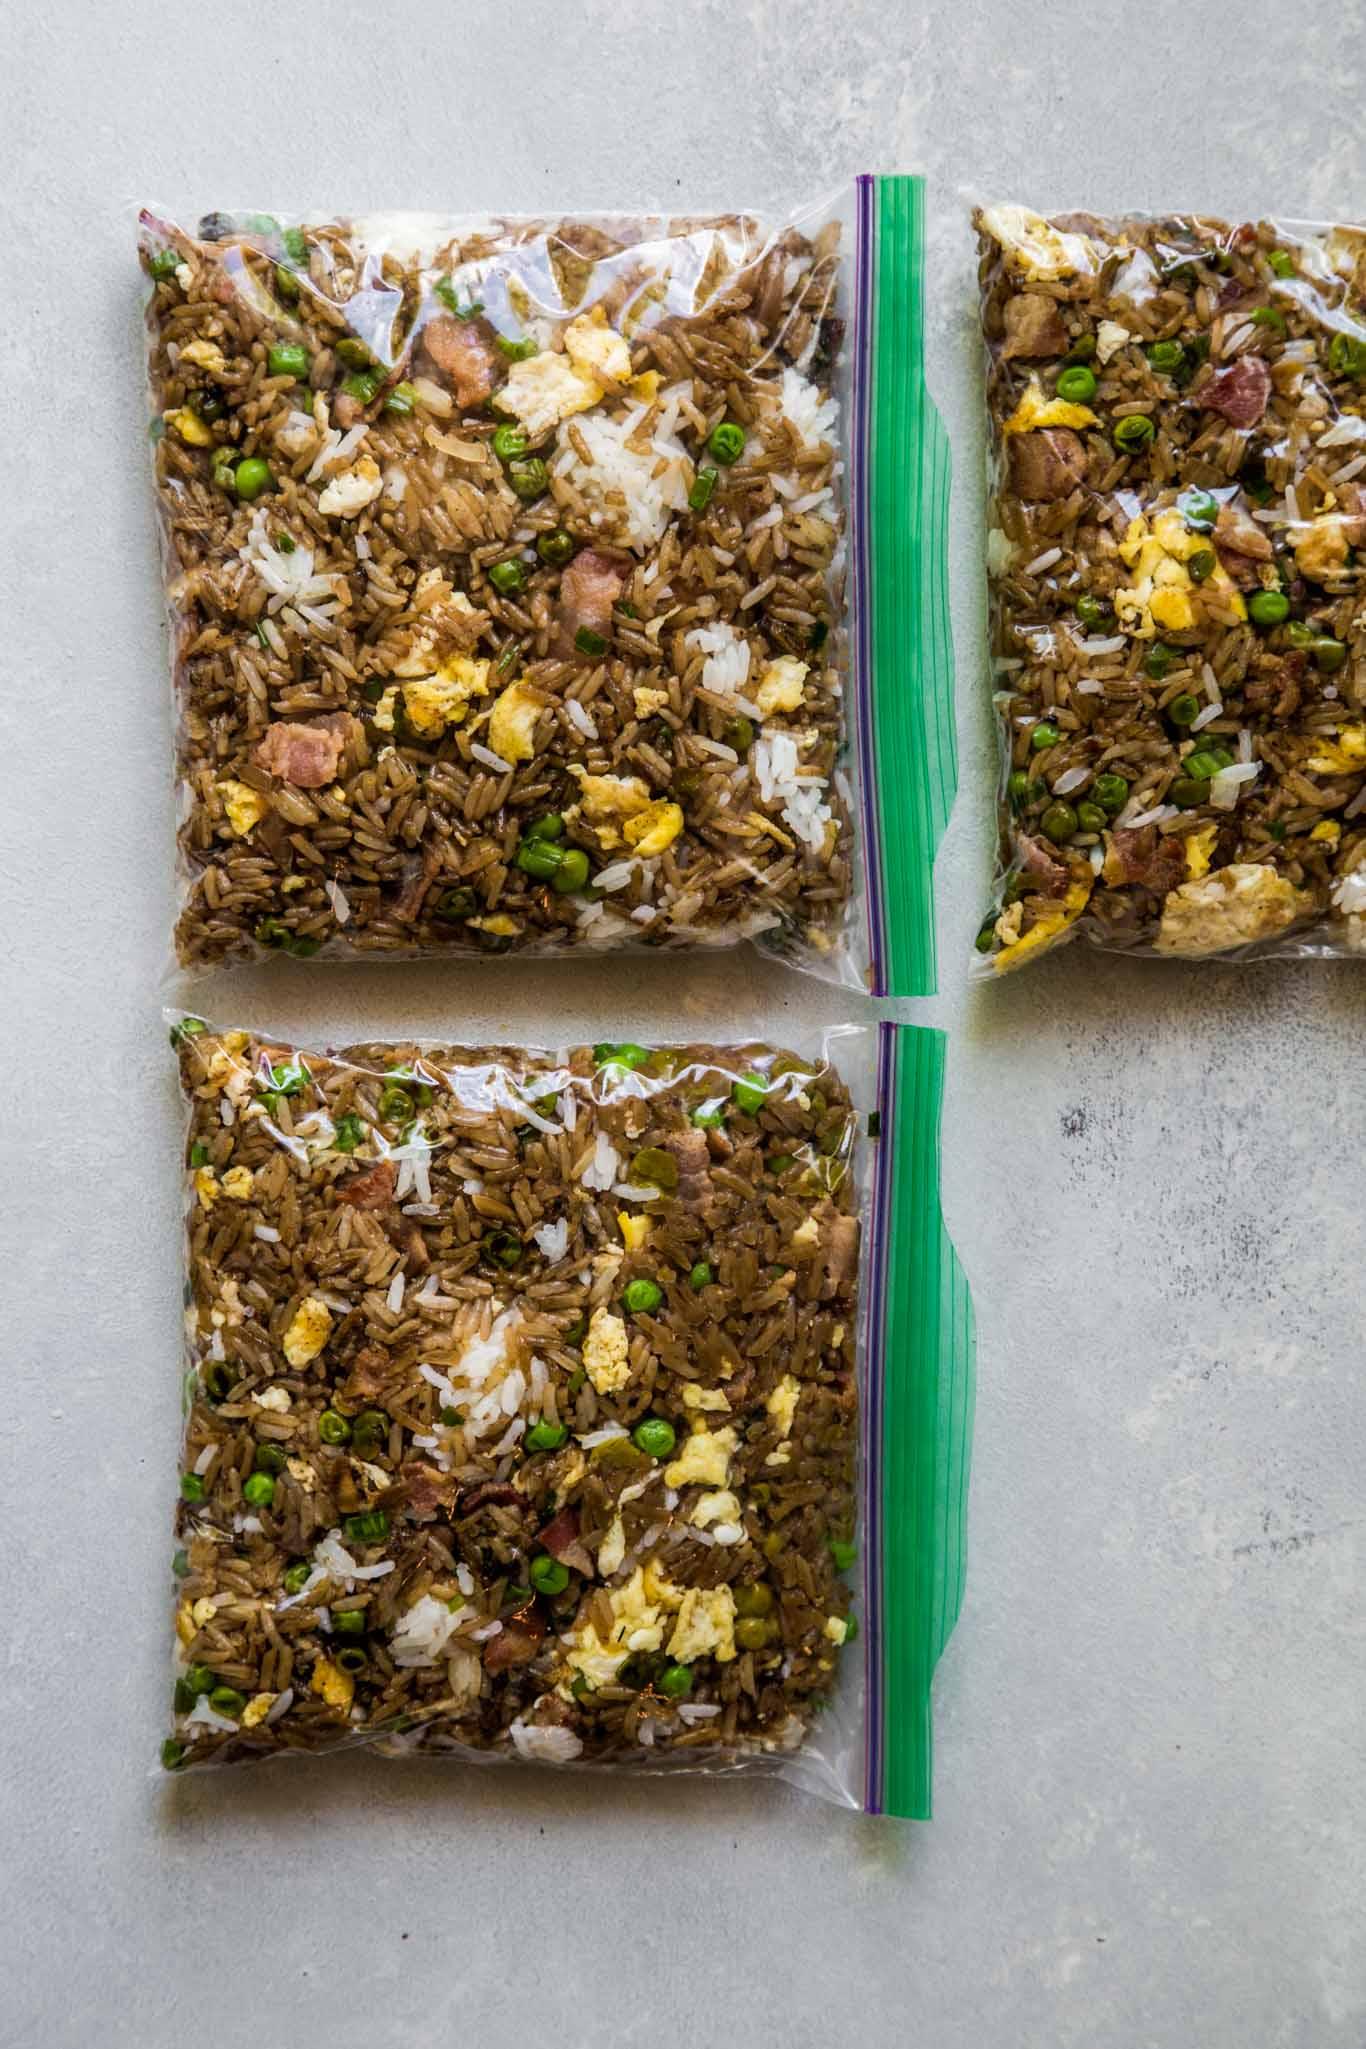 Fried rice in ziploc bags.